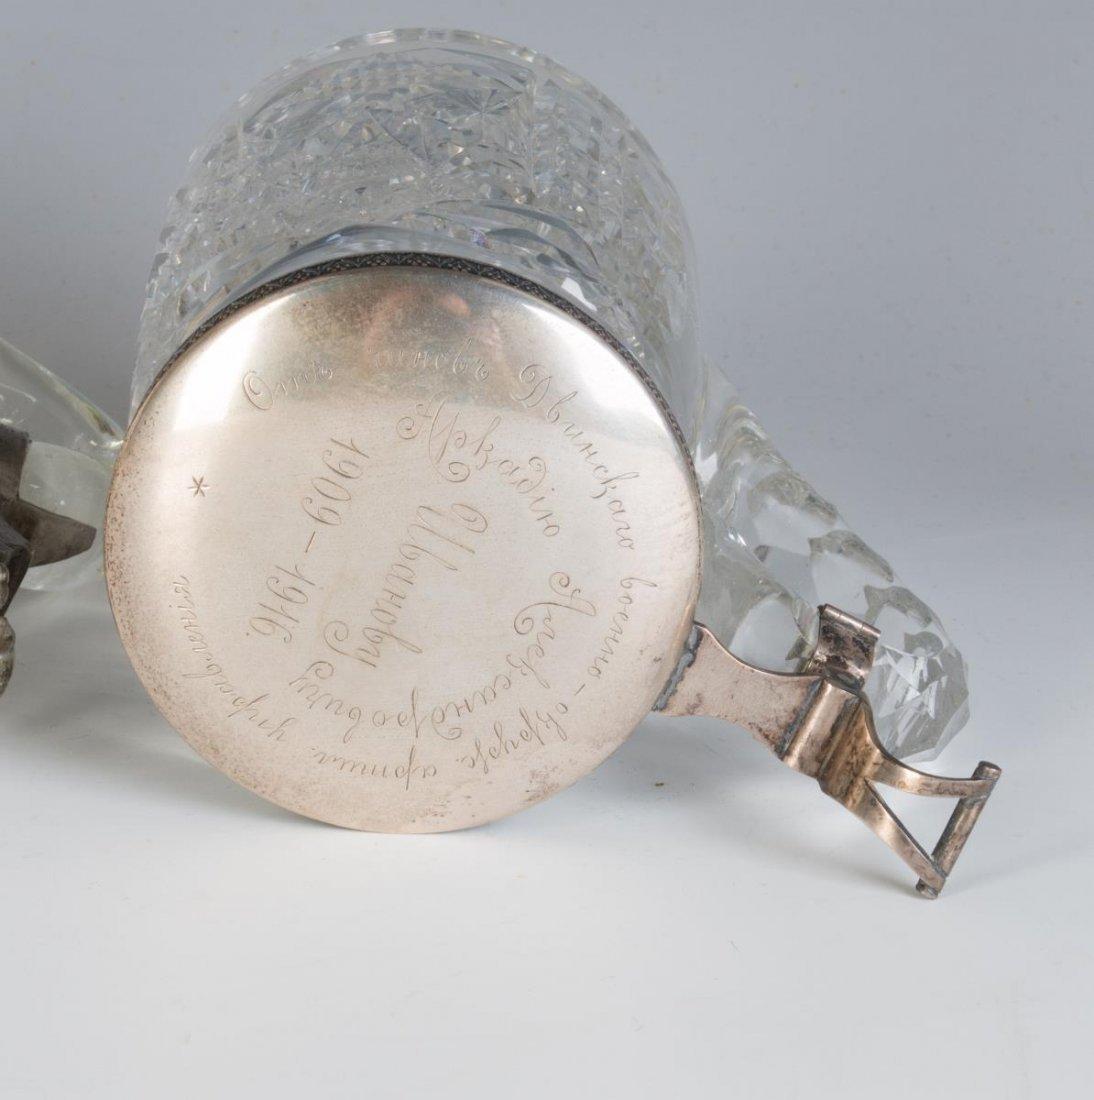 BACCARAT & RUSSIAN SILVER PRESENTATION STEIN, 1916 - 9